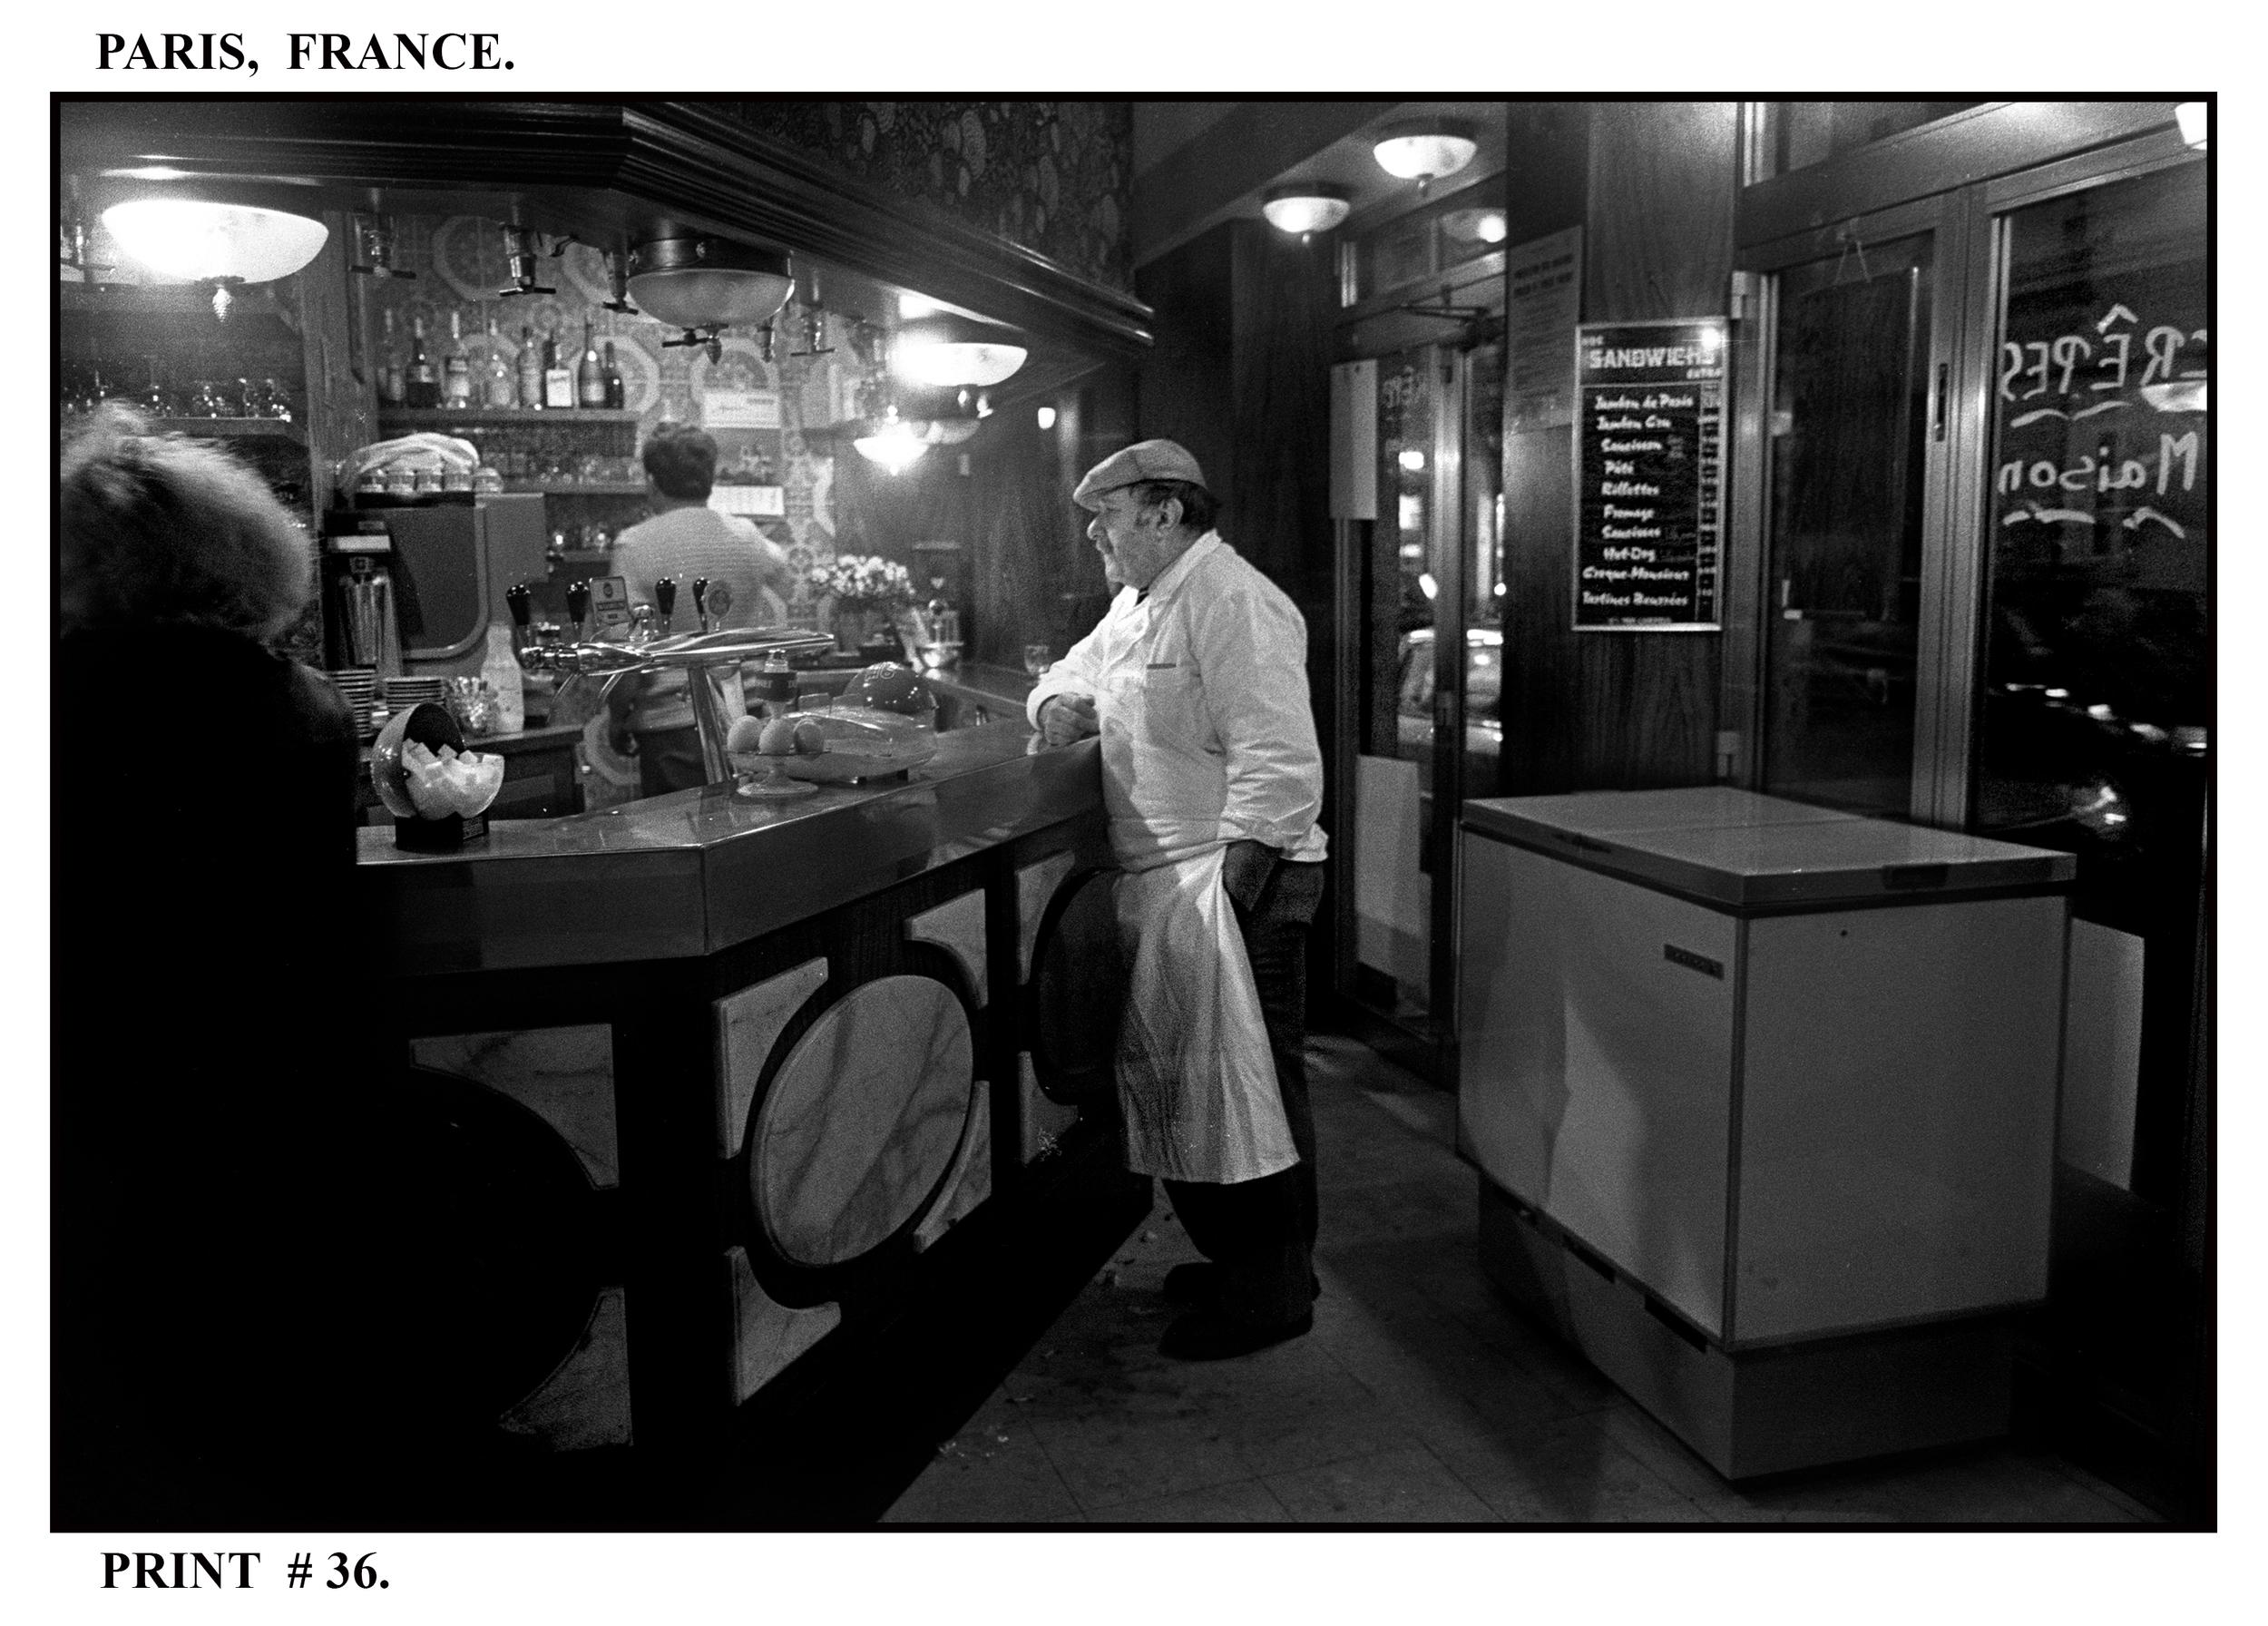 036PARIS, FRANCEA copy.jpg